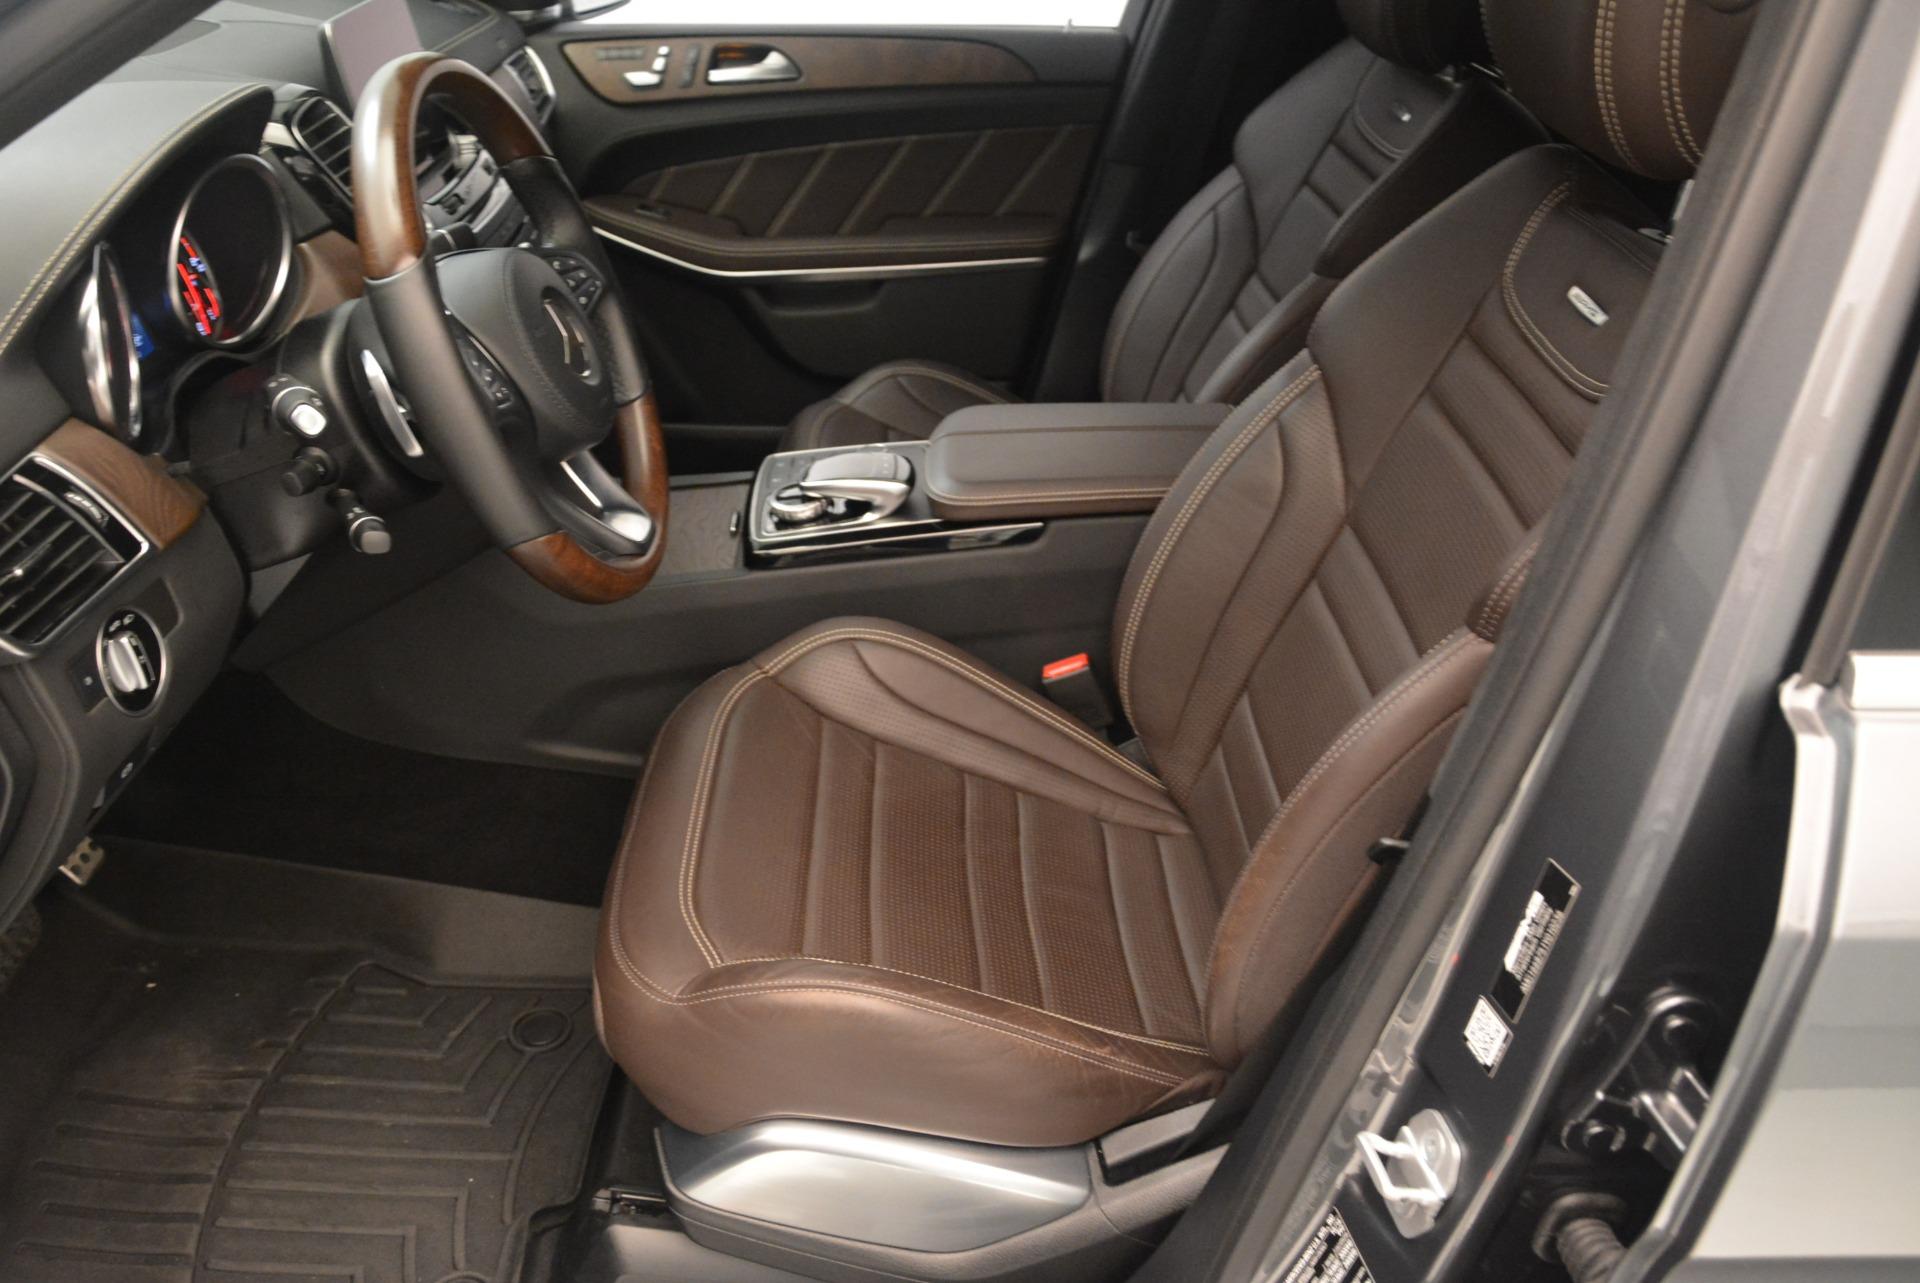 Used 2017 Mercedes-Benz GLS AMG GLS 63 For Sale In Westport, CT 2518_p15